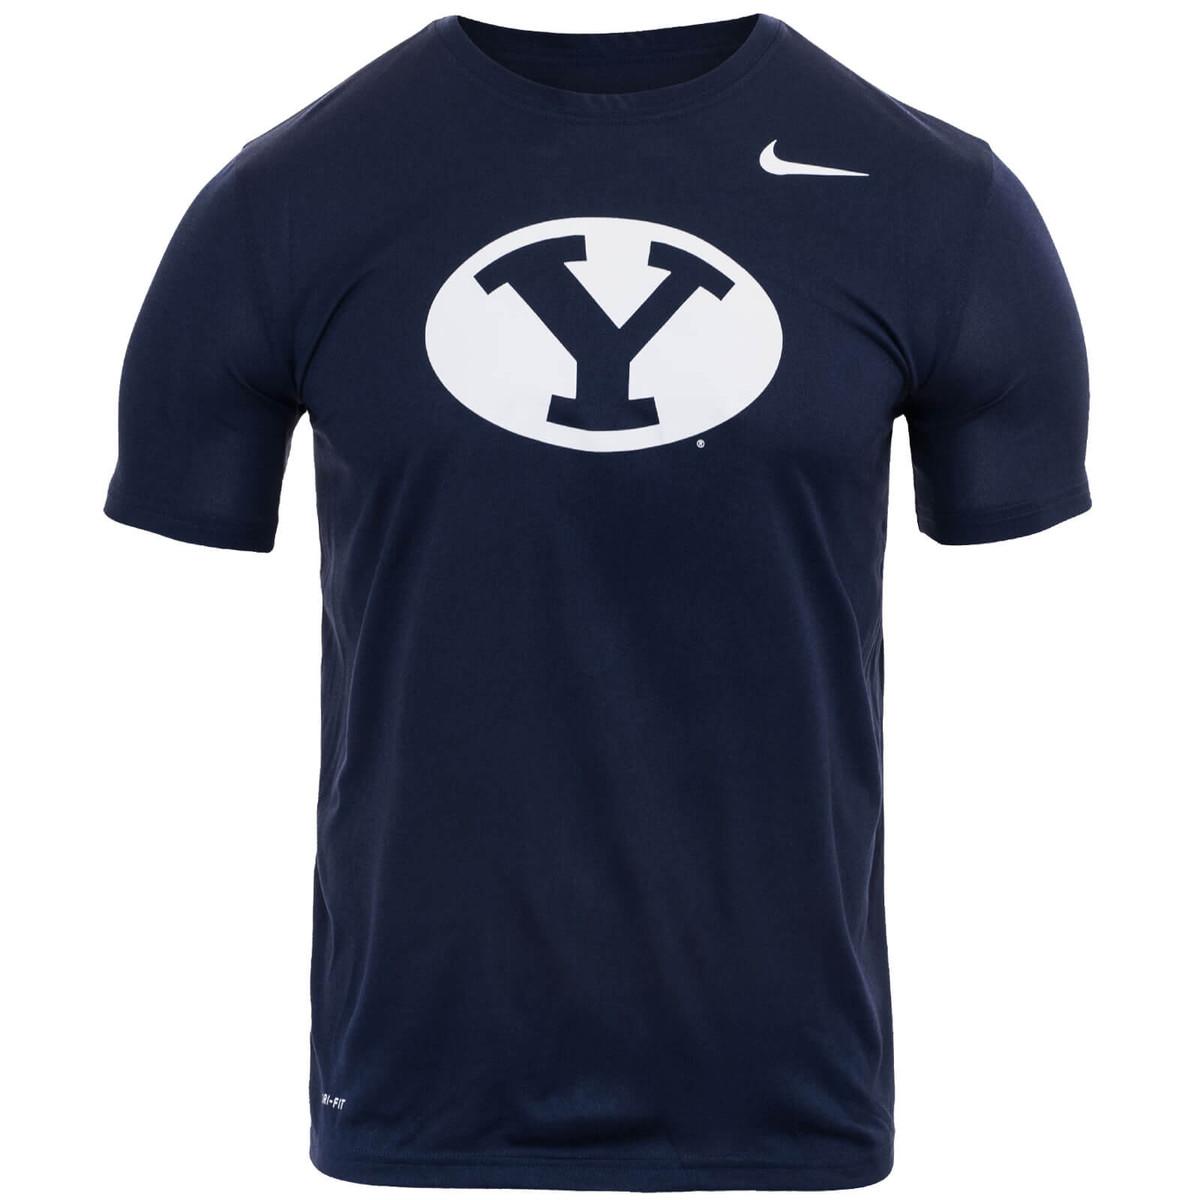 e507cb9b096 Shop All BYU T-Shirts